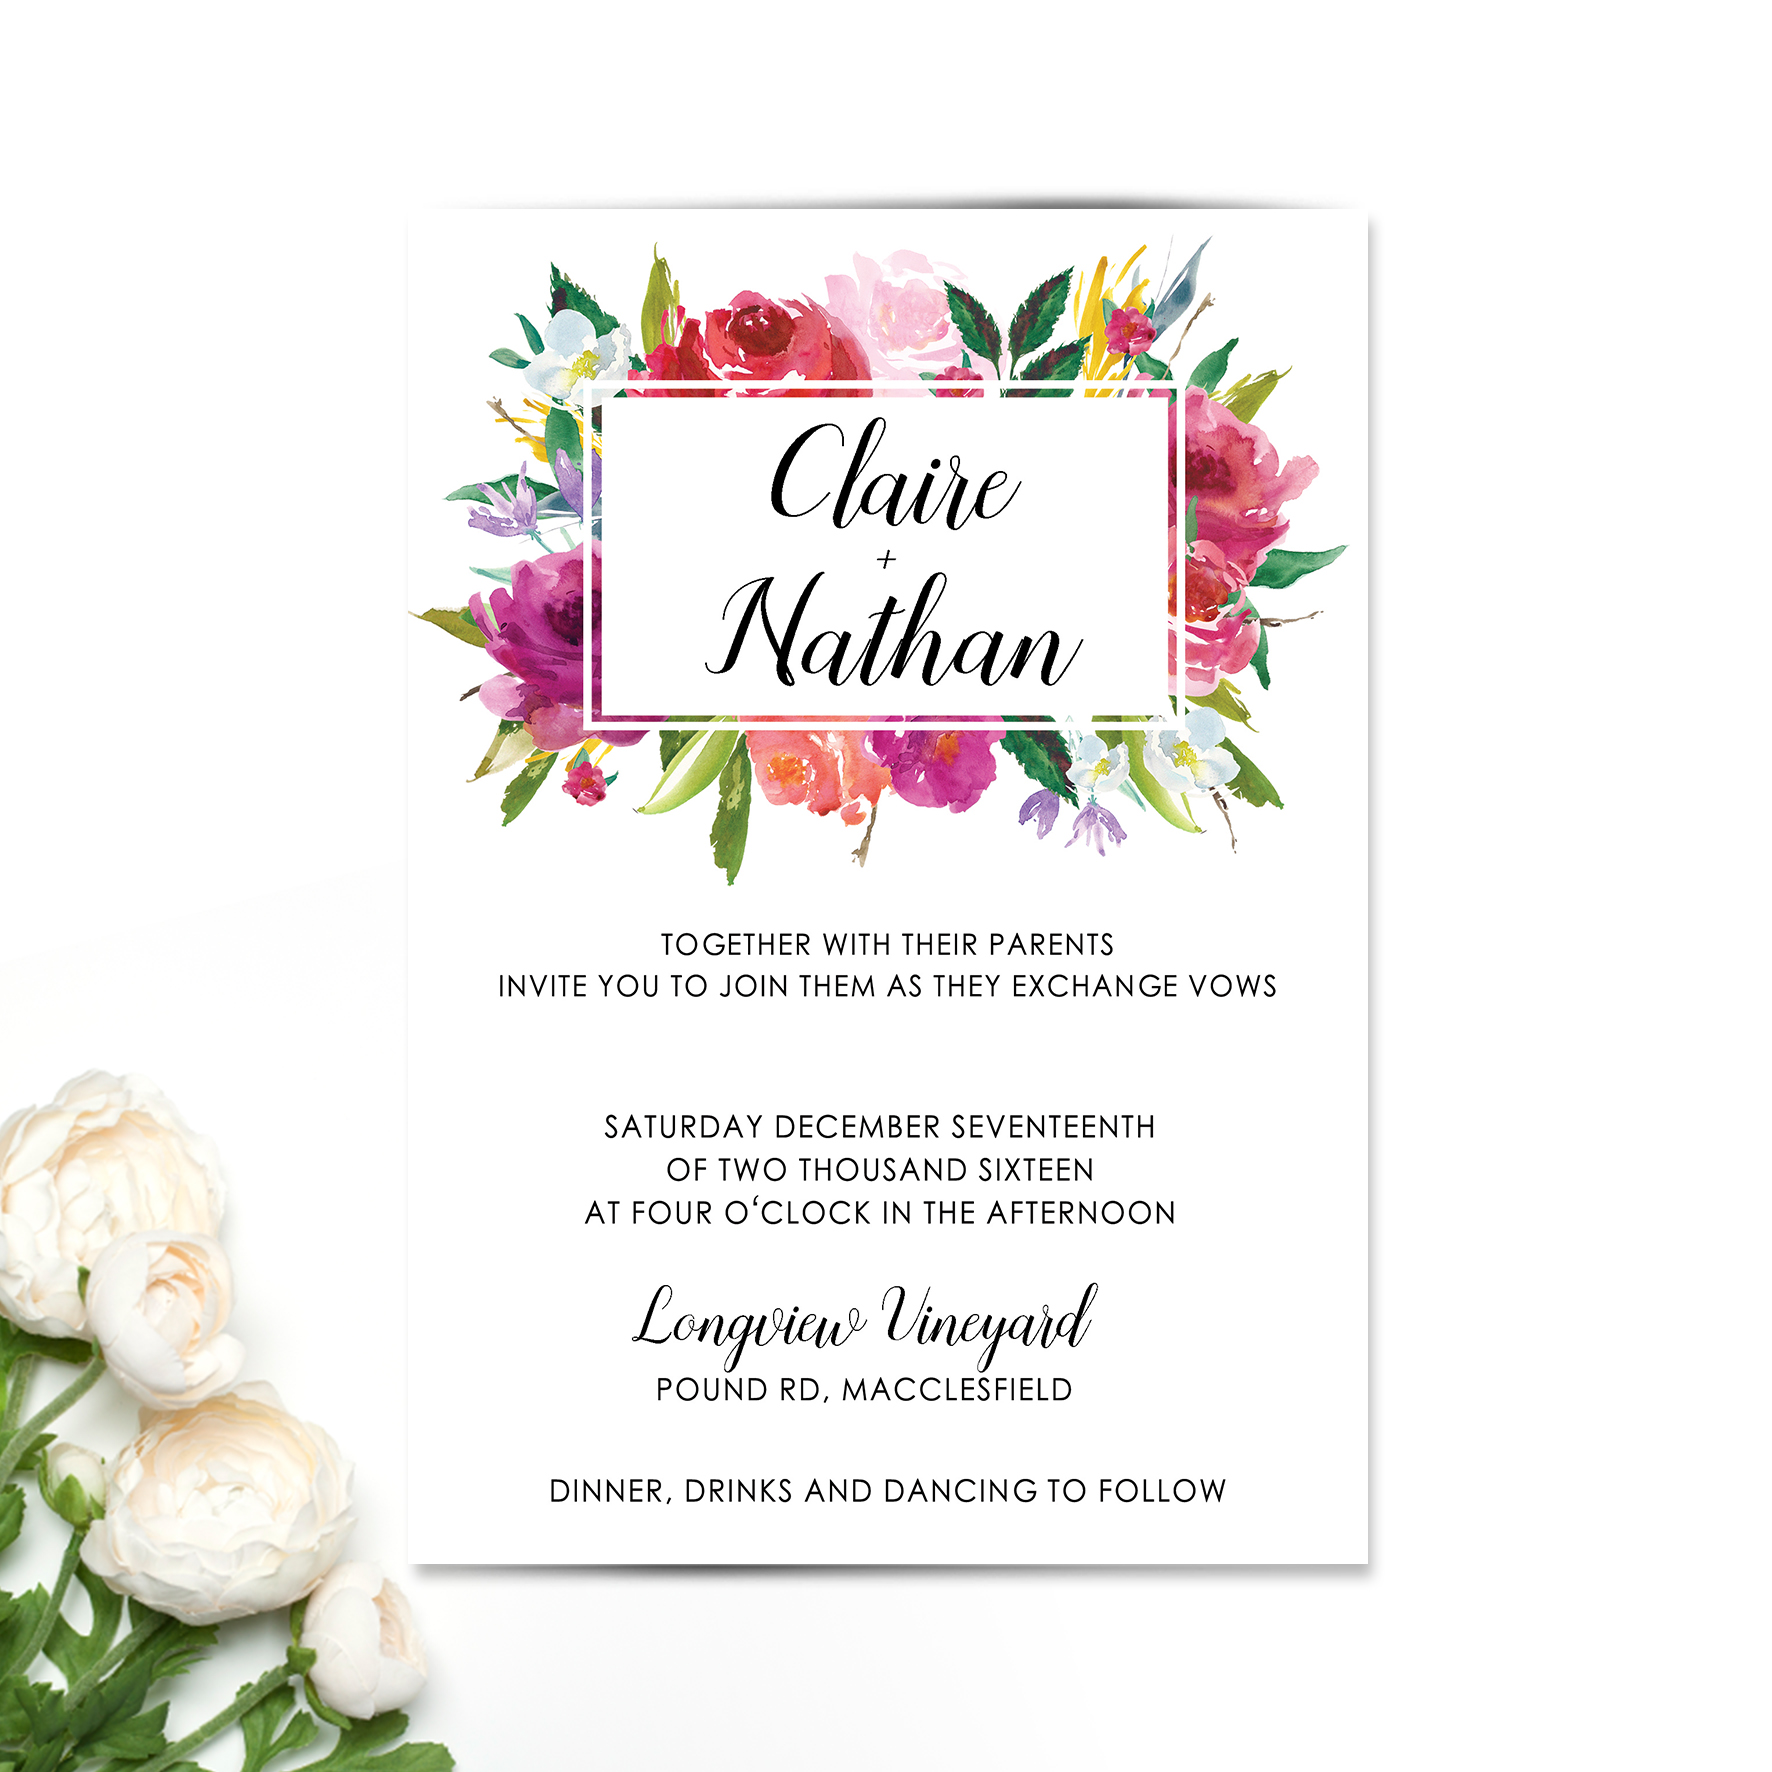 Bright Rosey Floral Wedding Invitation